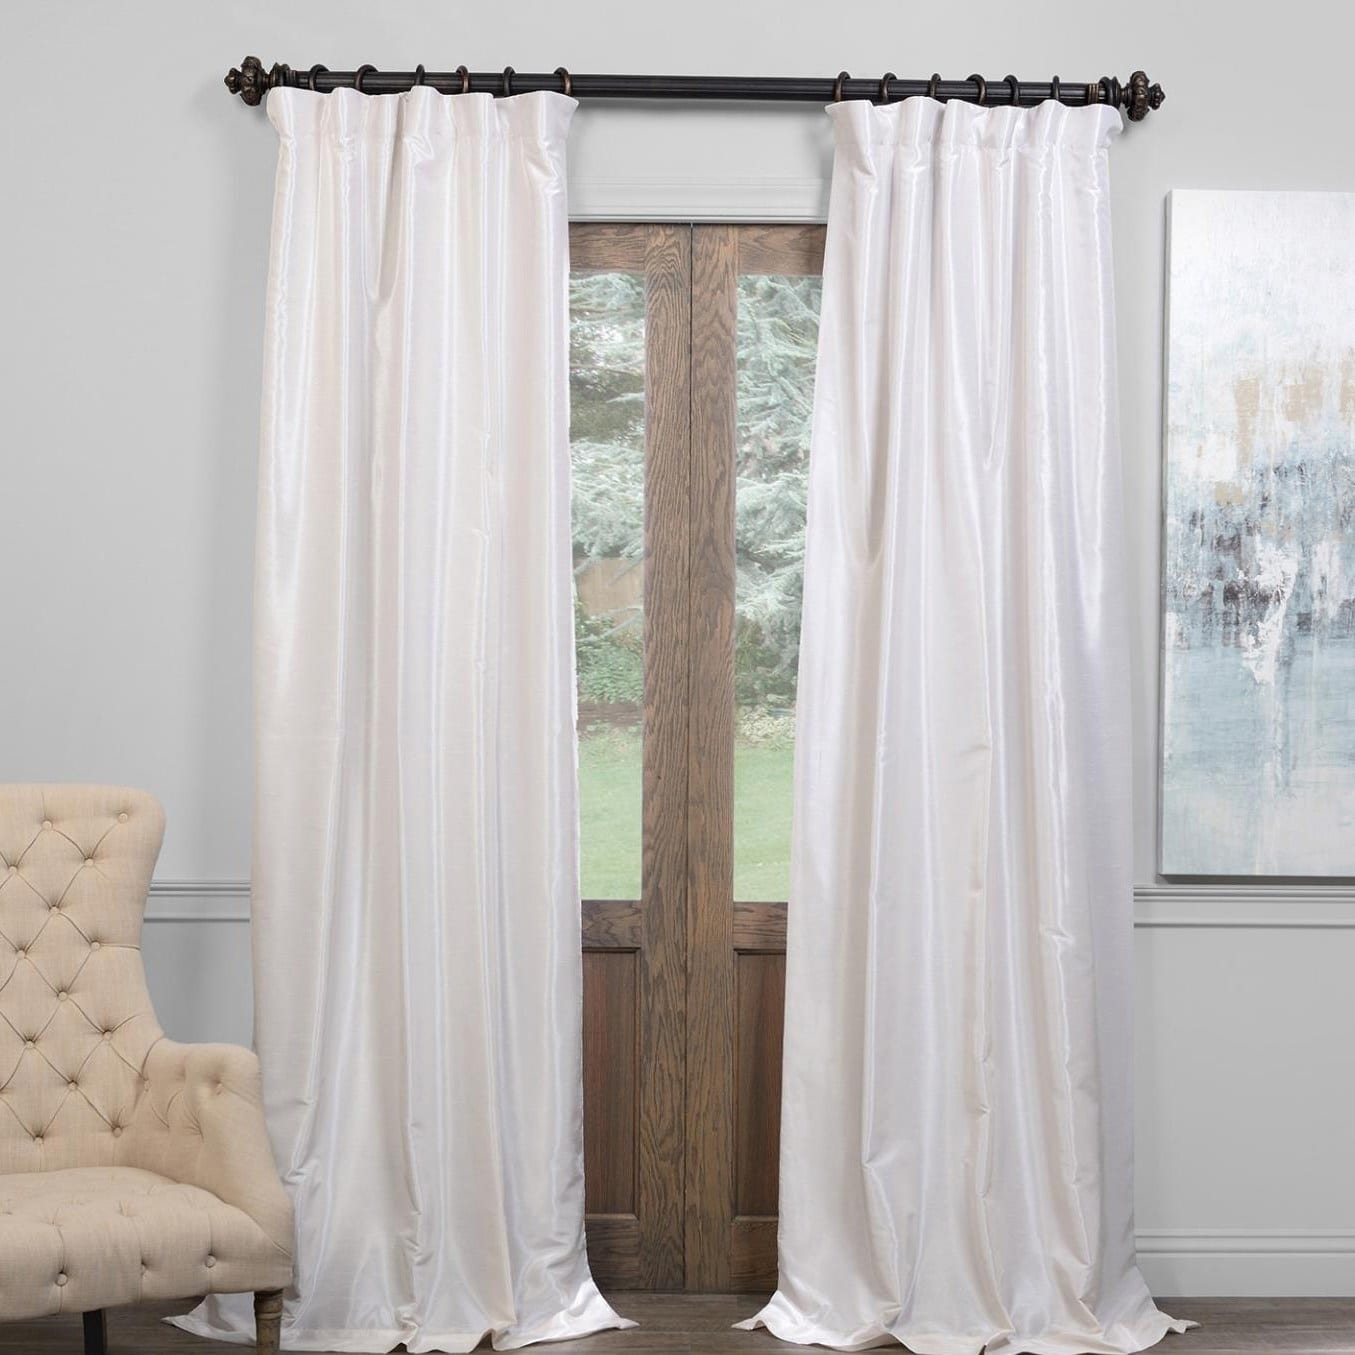 Exclusive Fabrics True Blackout Vintage Textured Faux In Vintage Textured Faux Dupioni Silk Curtain Panels (View 6 of 30)